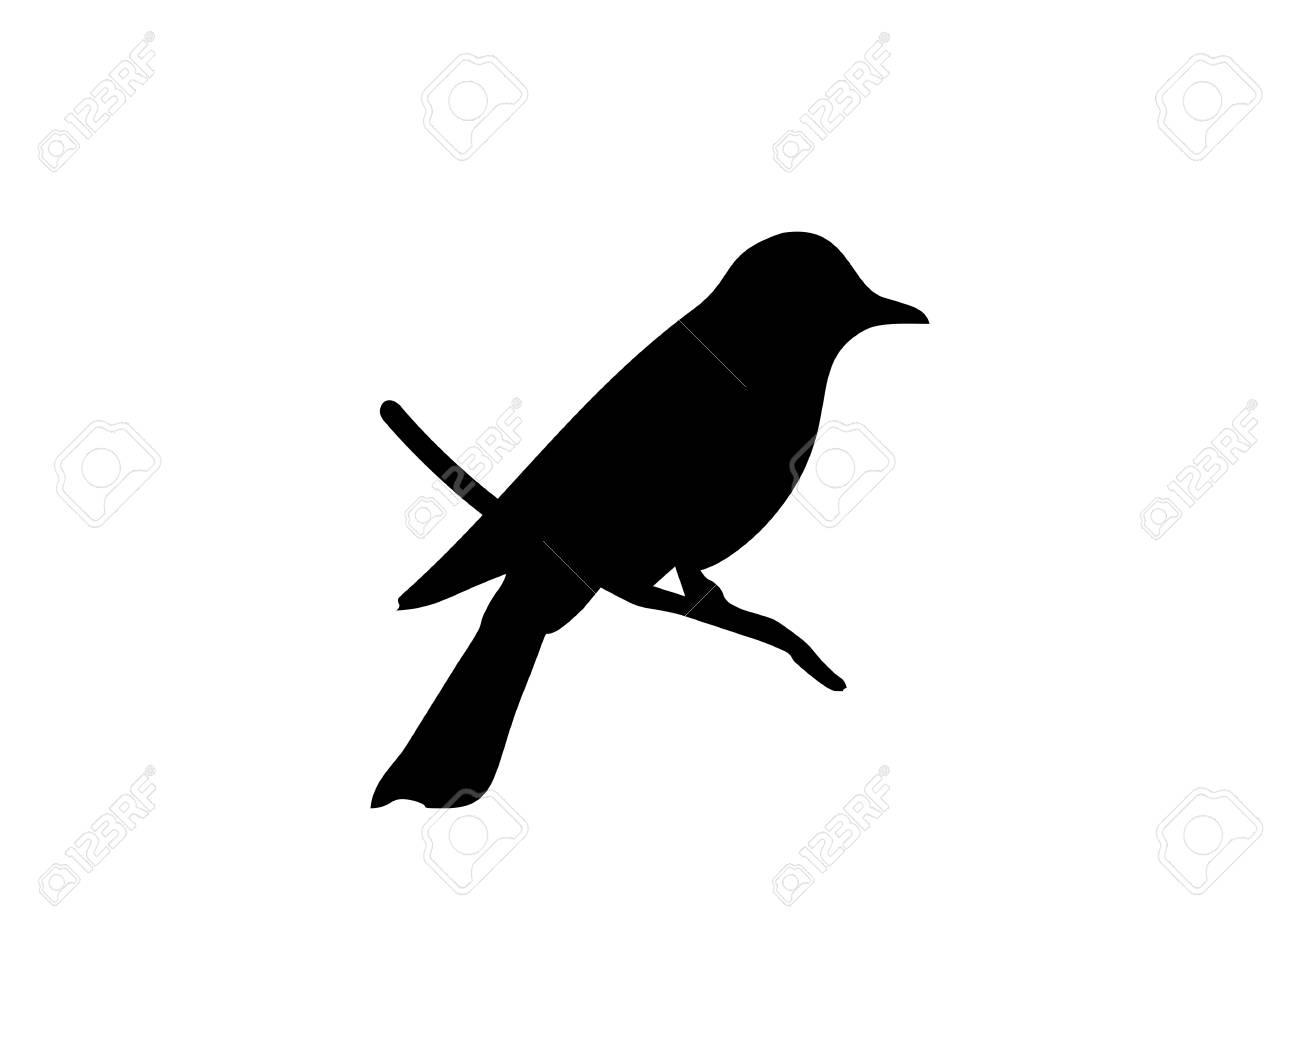 bird silhouette vector icon royalty free cliparts vectors and rh 123rf com cute bird silhouette vector sparrow silhouette vector